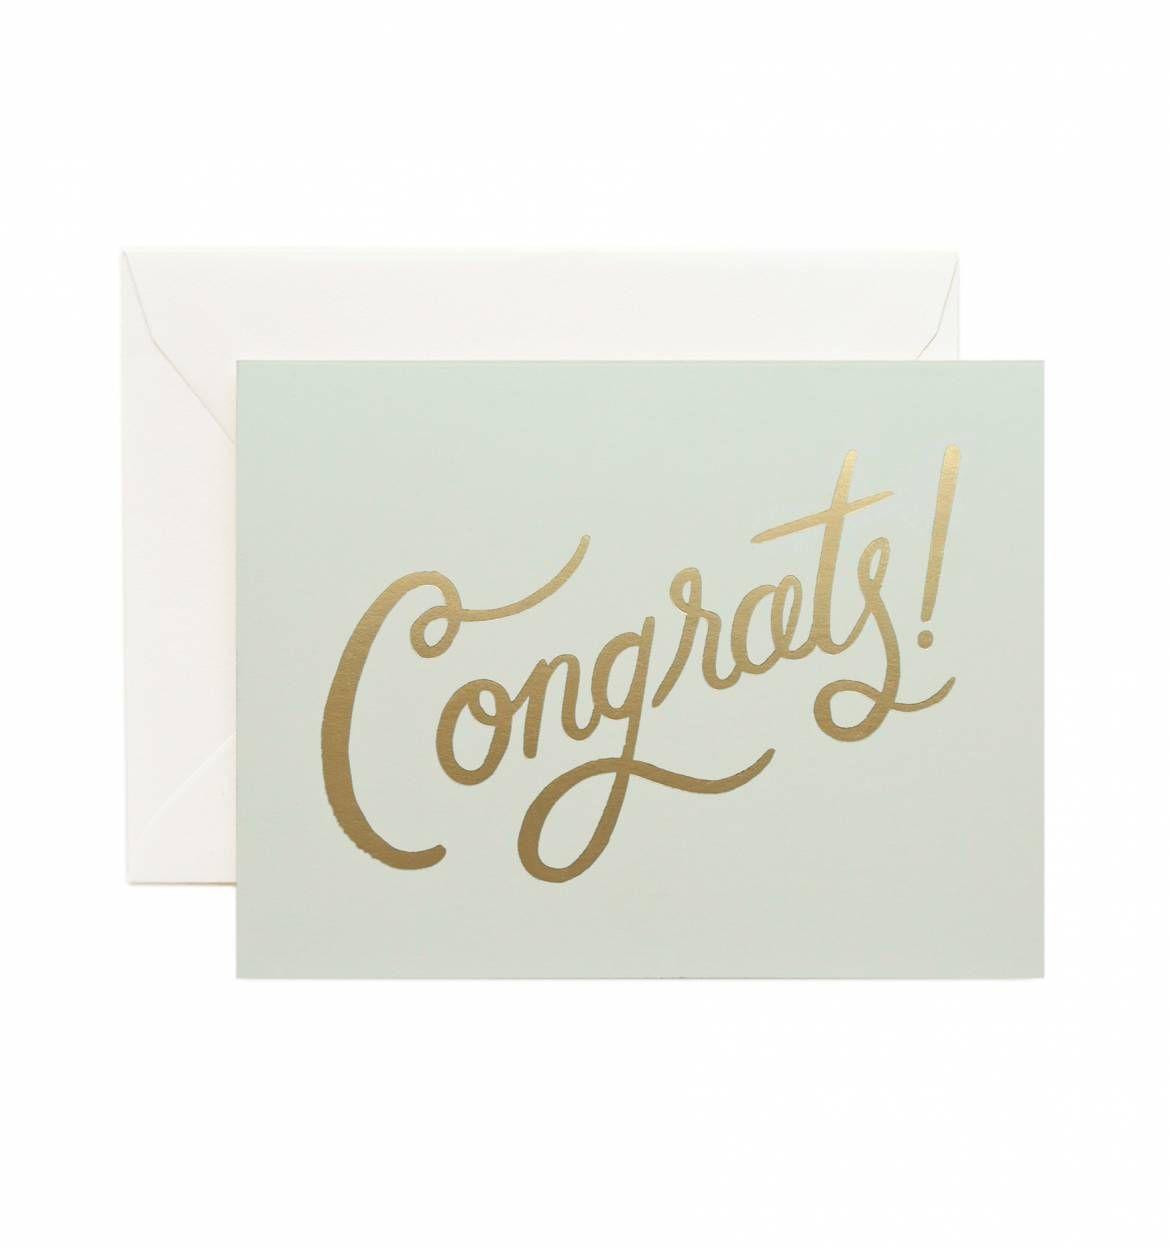 Timeless Greeting Card Box Sets Congratulations Greetings And Box